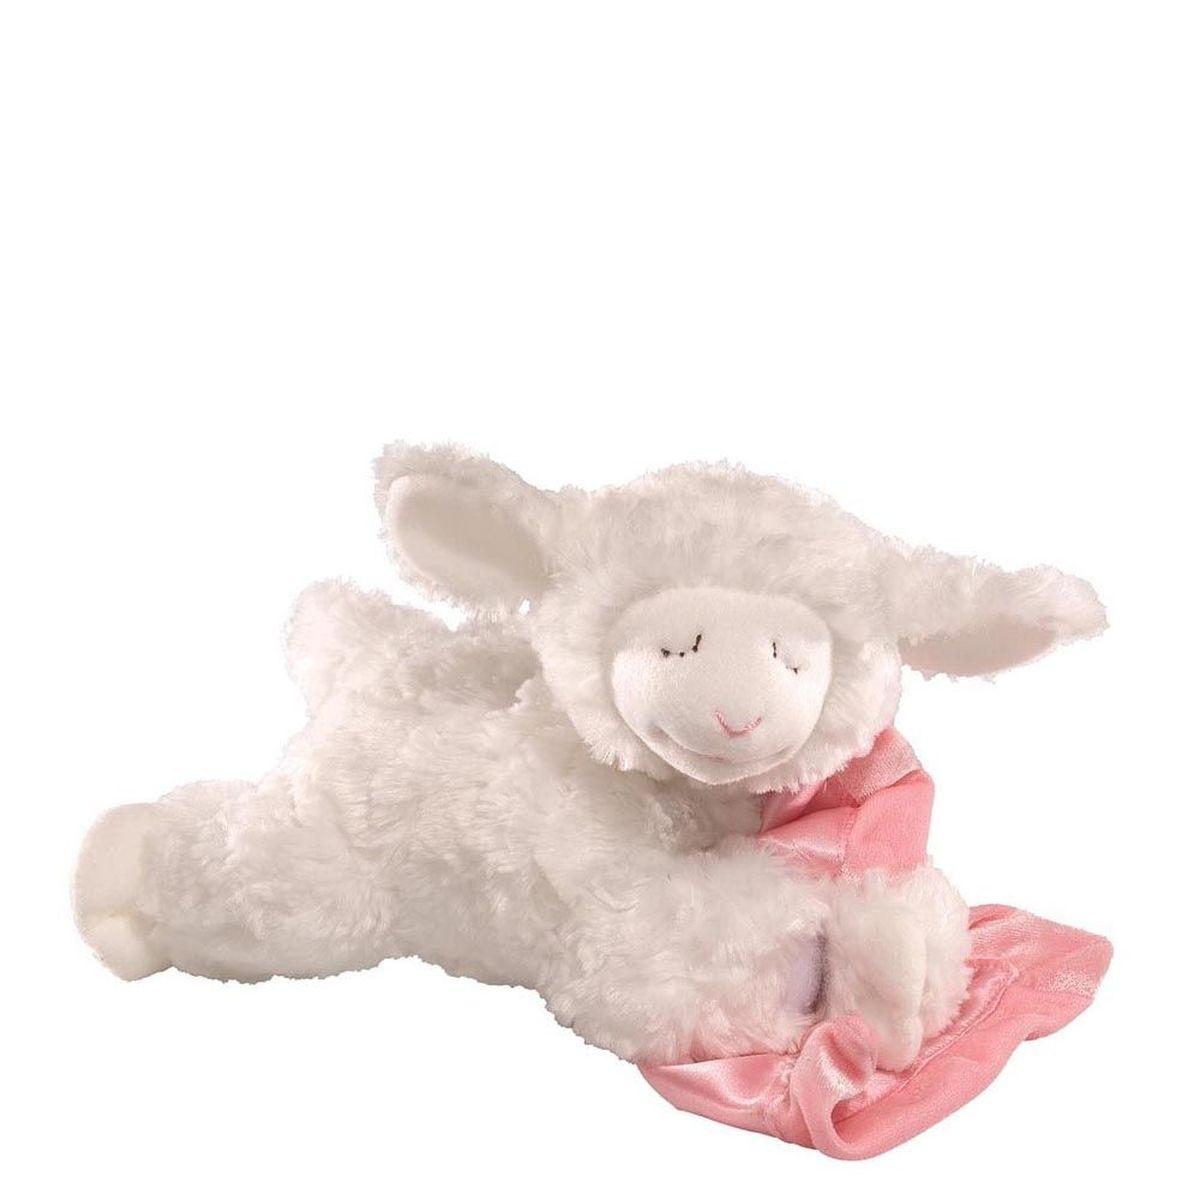 Gund Мягкая игрушка Prayer Winky Lamb Pink 15 см недорого